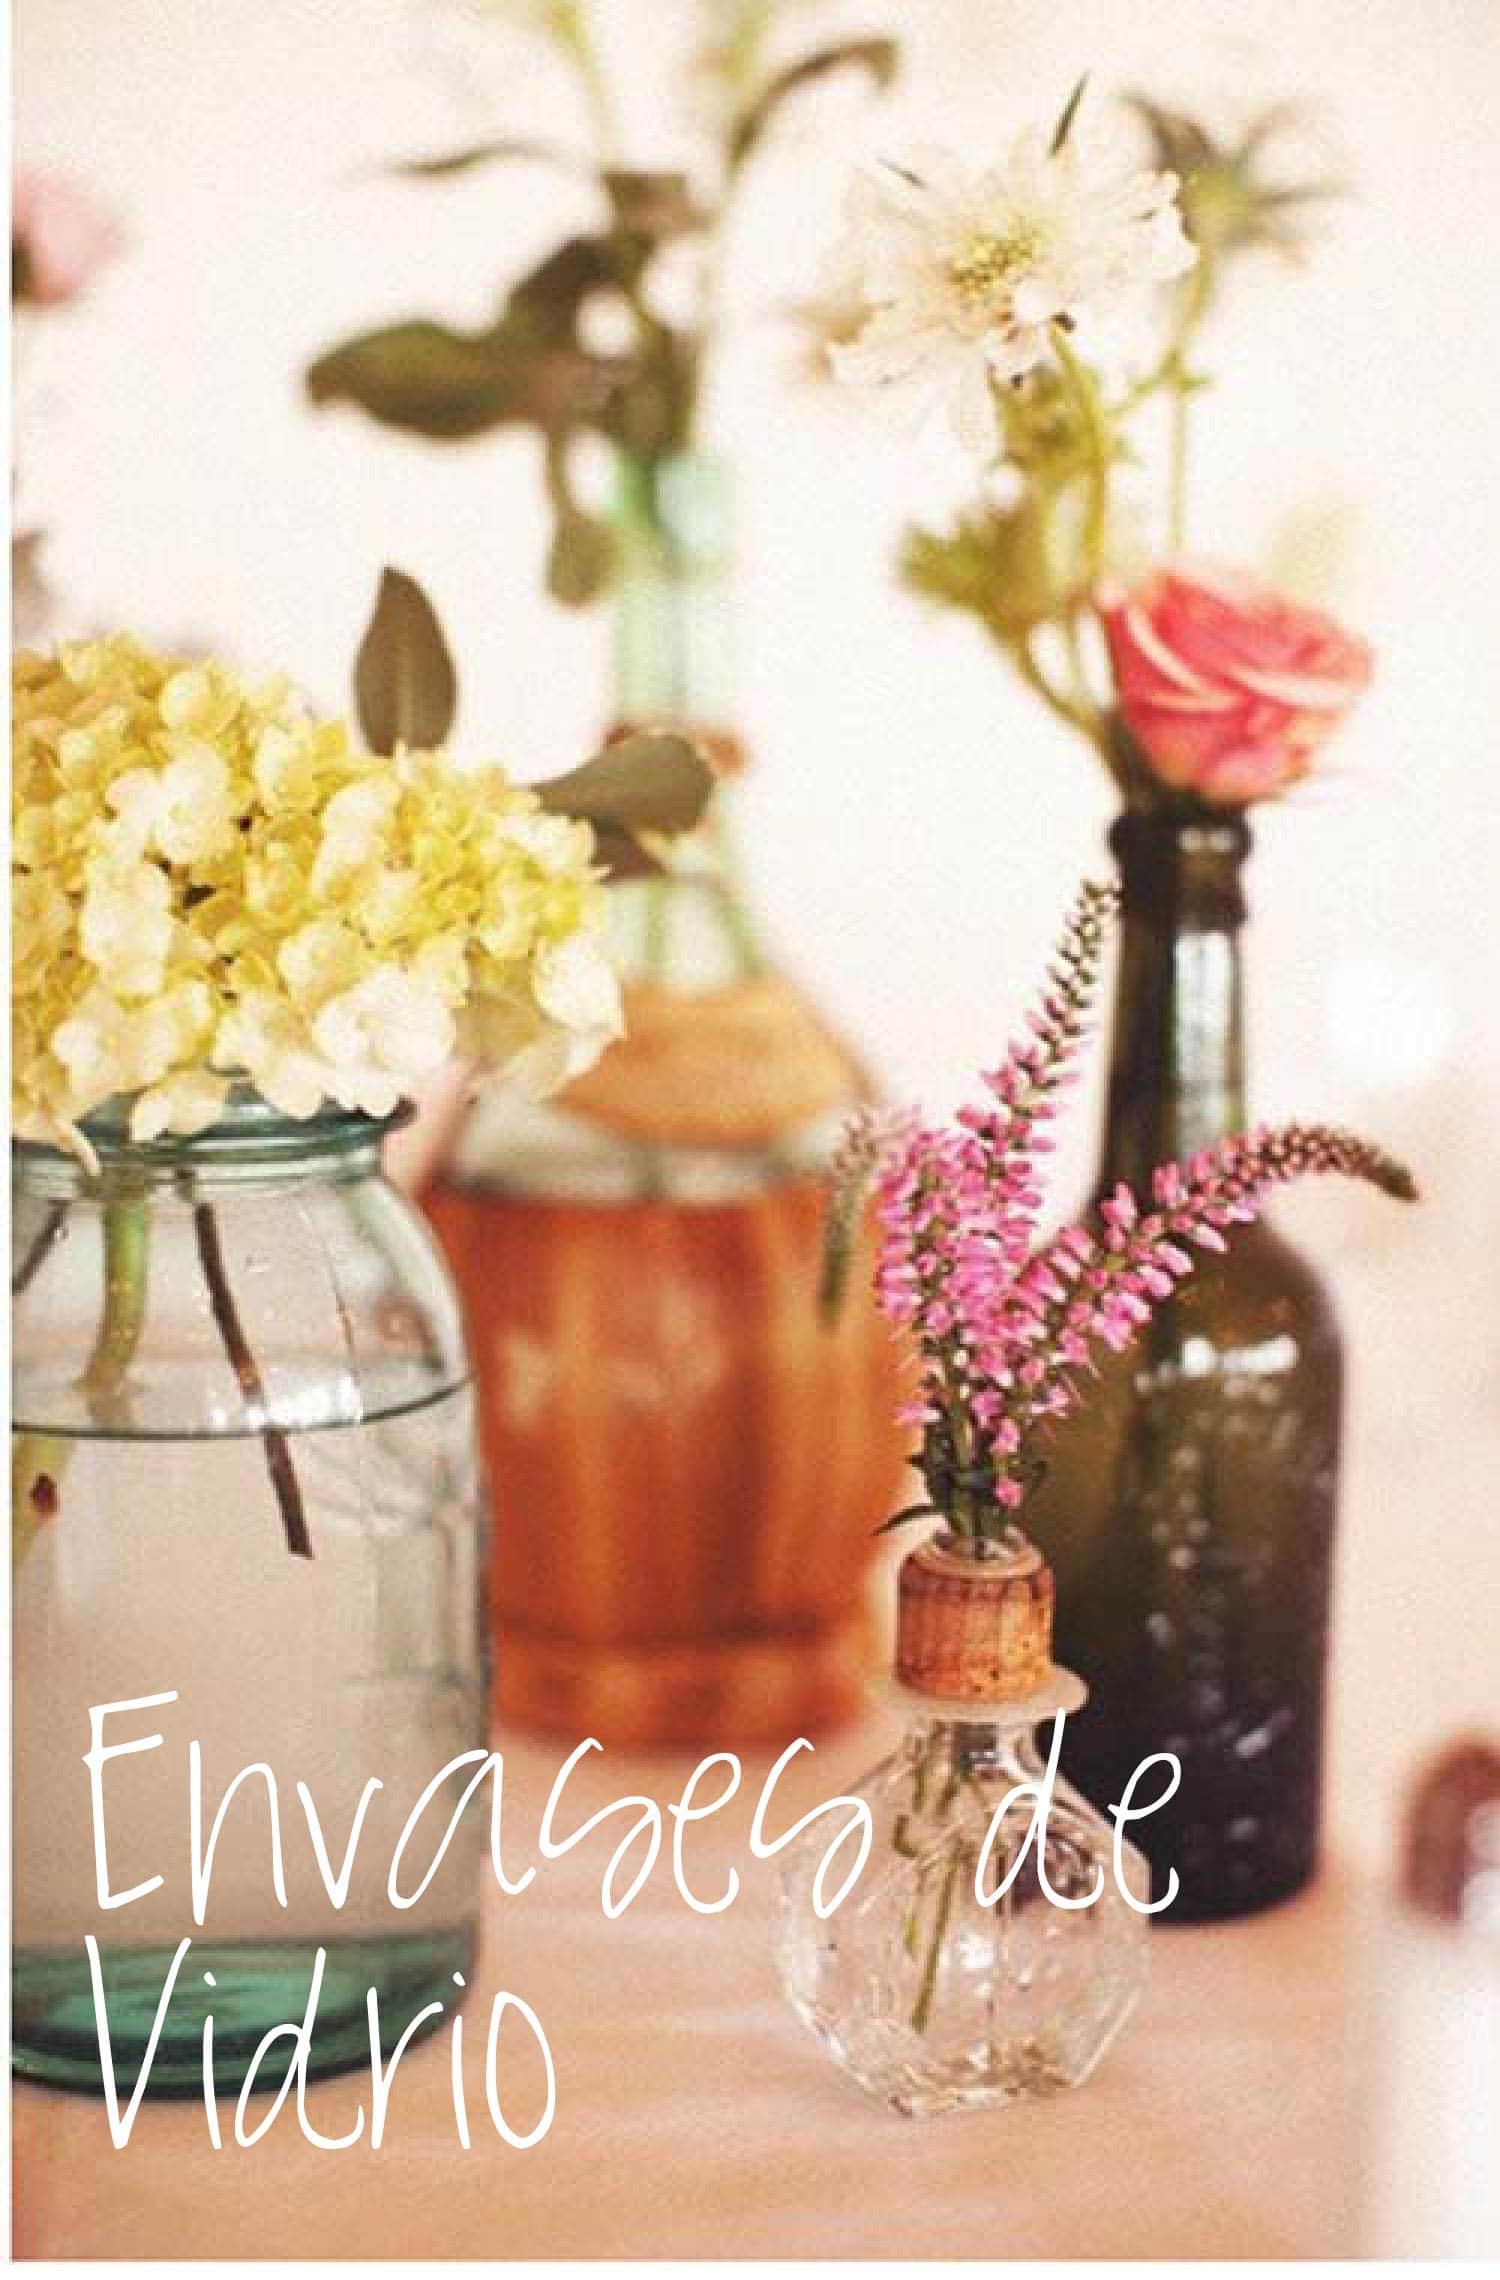 LEMONBE_Marzo_2015_primavera_flores_envases de vidrio